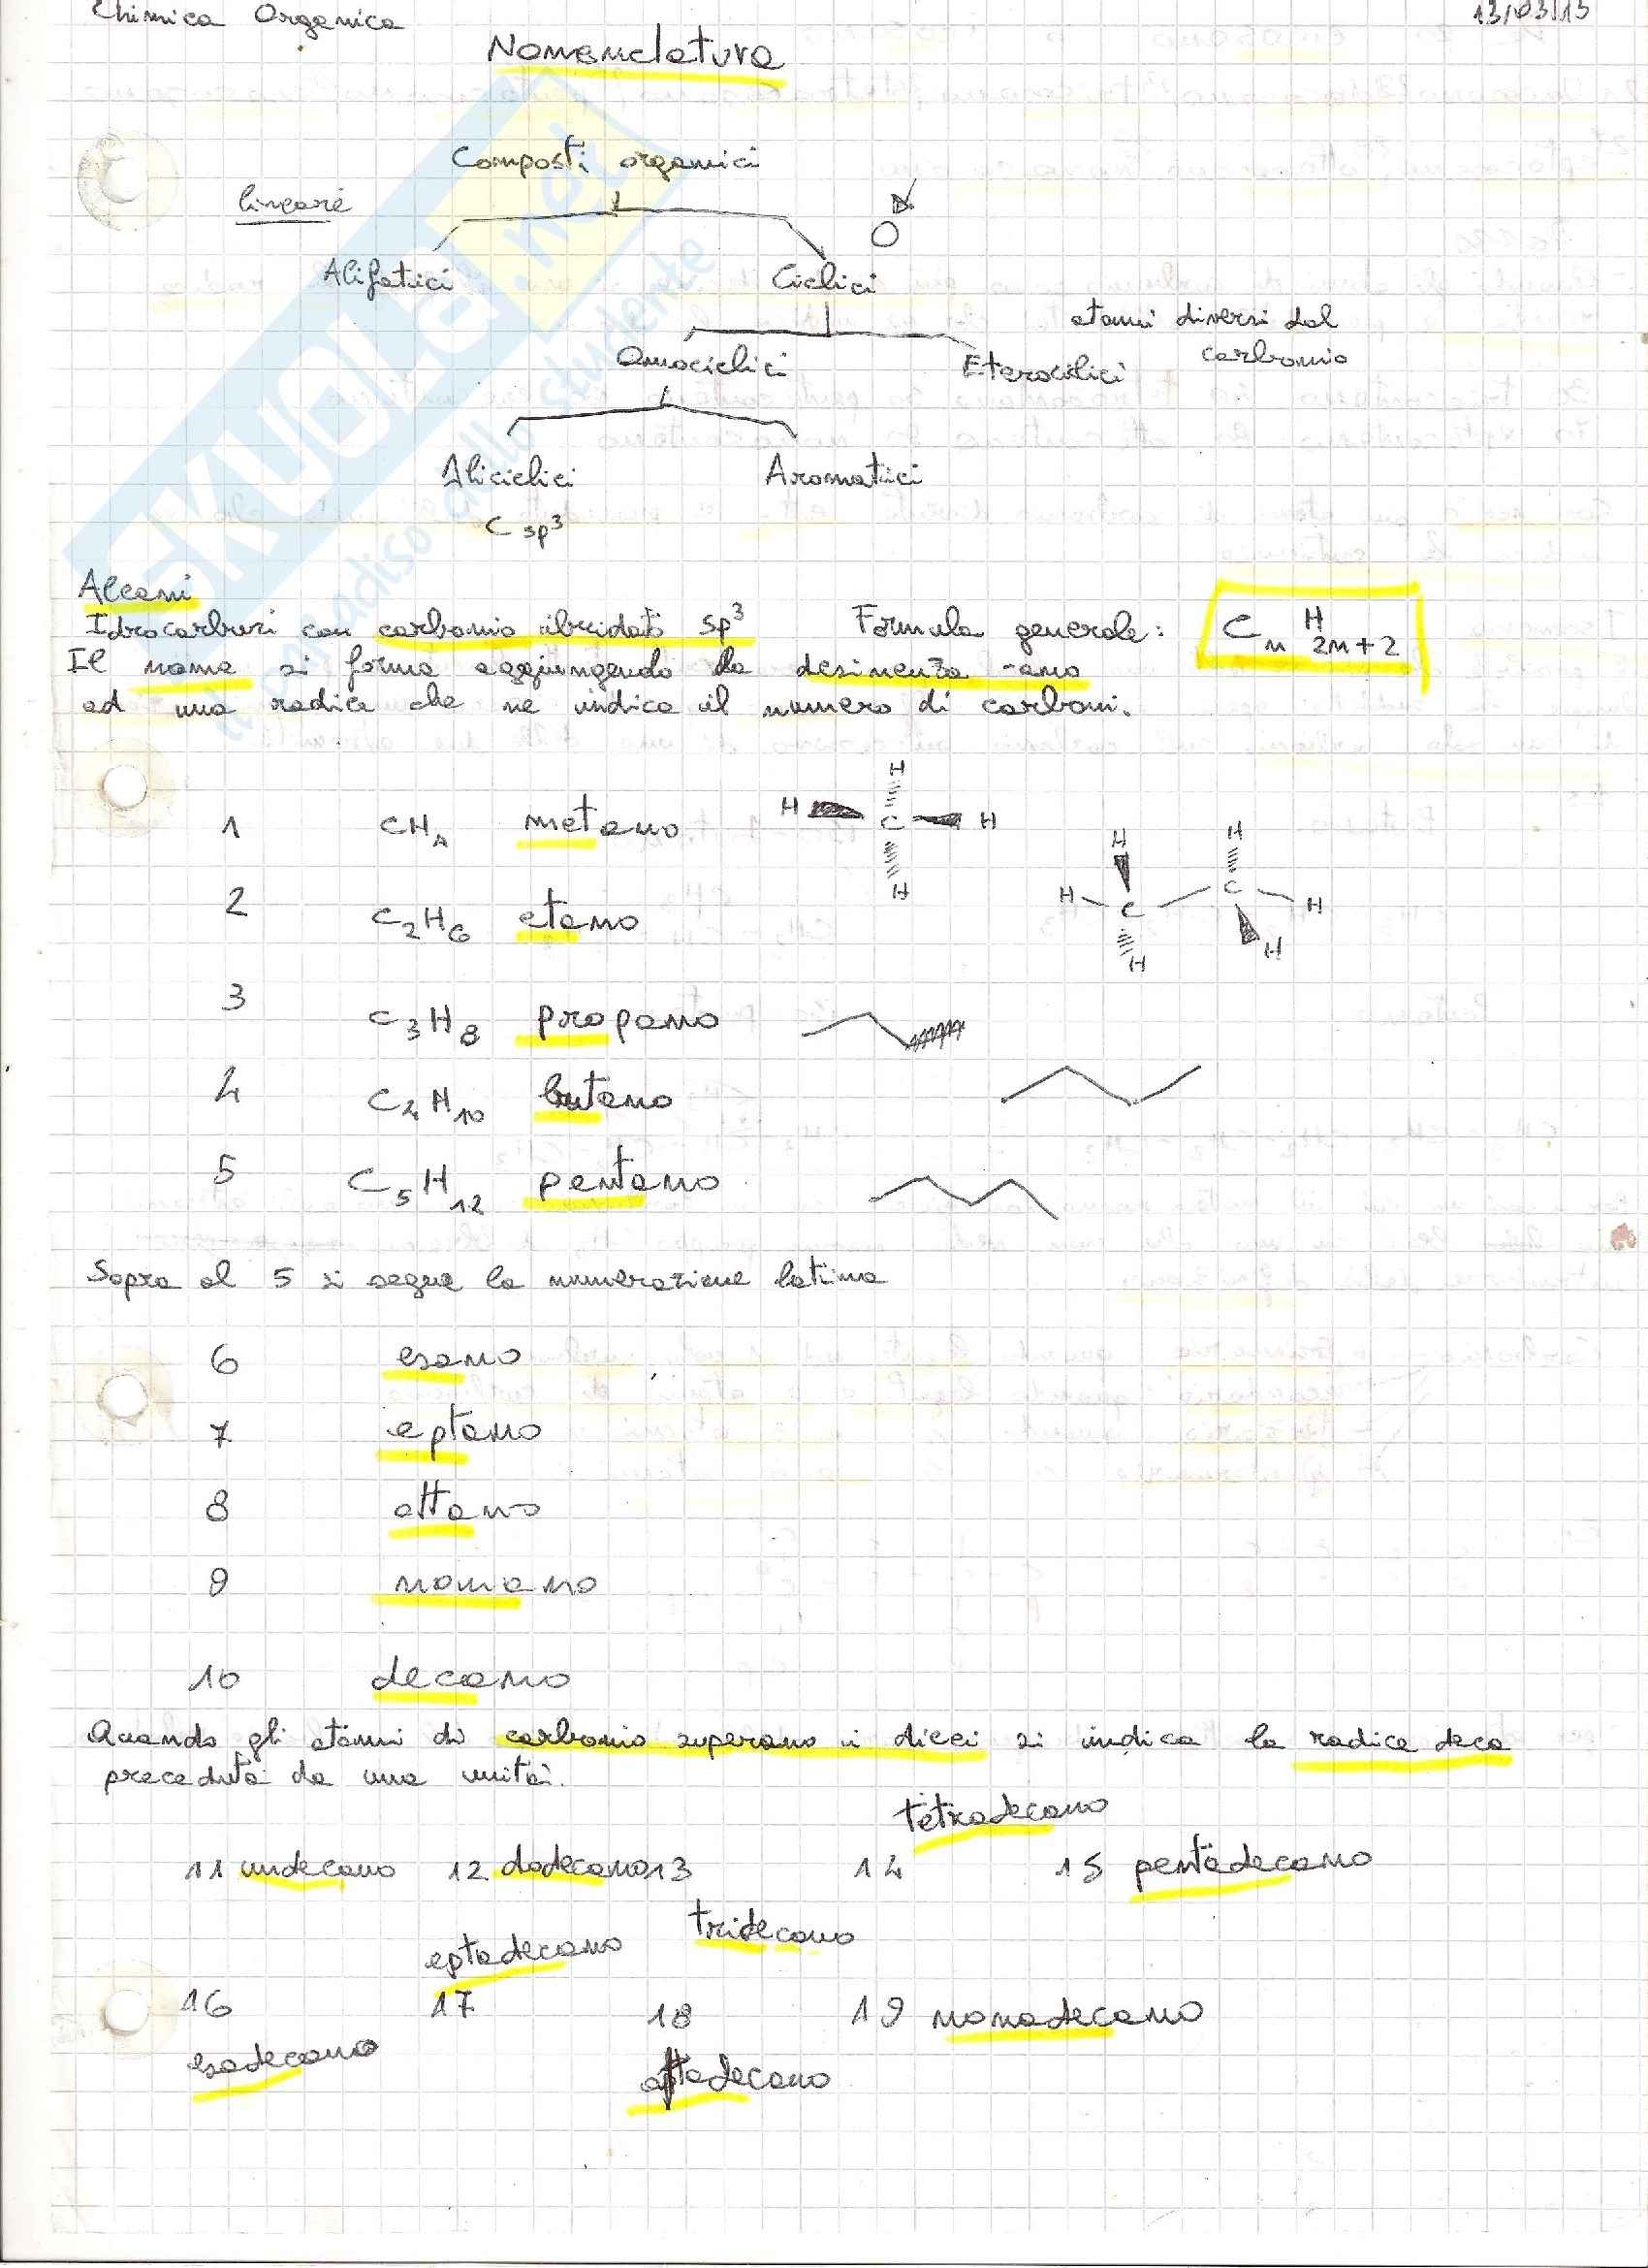 Riassunto esame Chimica Organica: nomenclatura, stereochimica, reazioni, prof. Floris